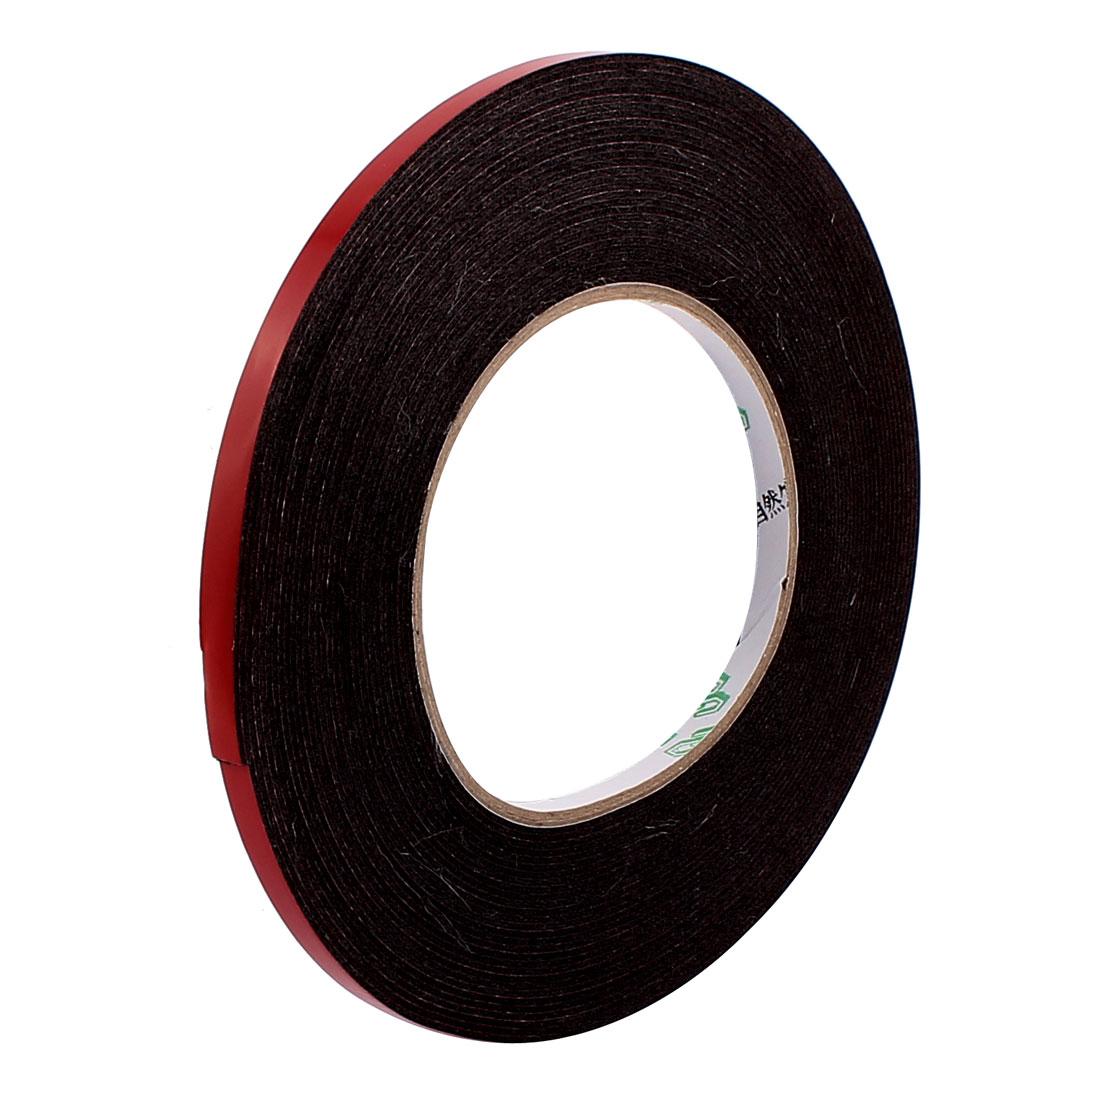 6mmx1mm Double Sided Sponge Tape Adhesive Sticker Foam Glue Strip Sealing 33Ft